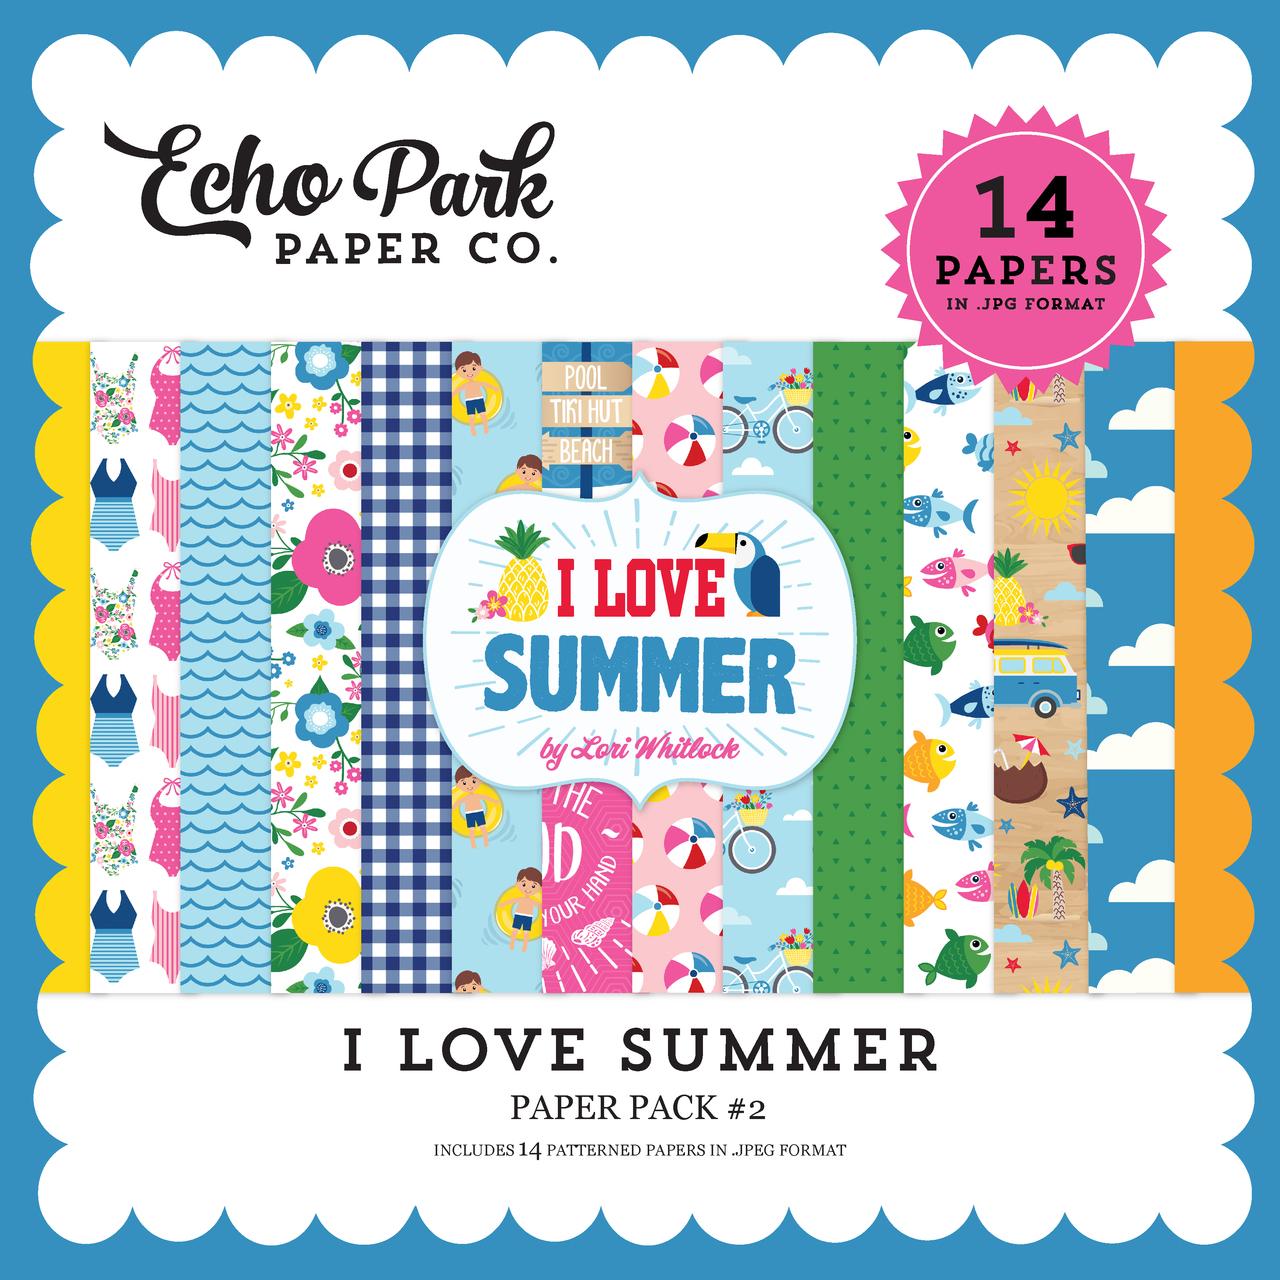 I Love Summer Paper Pack #2